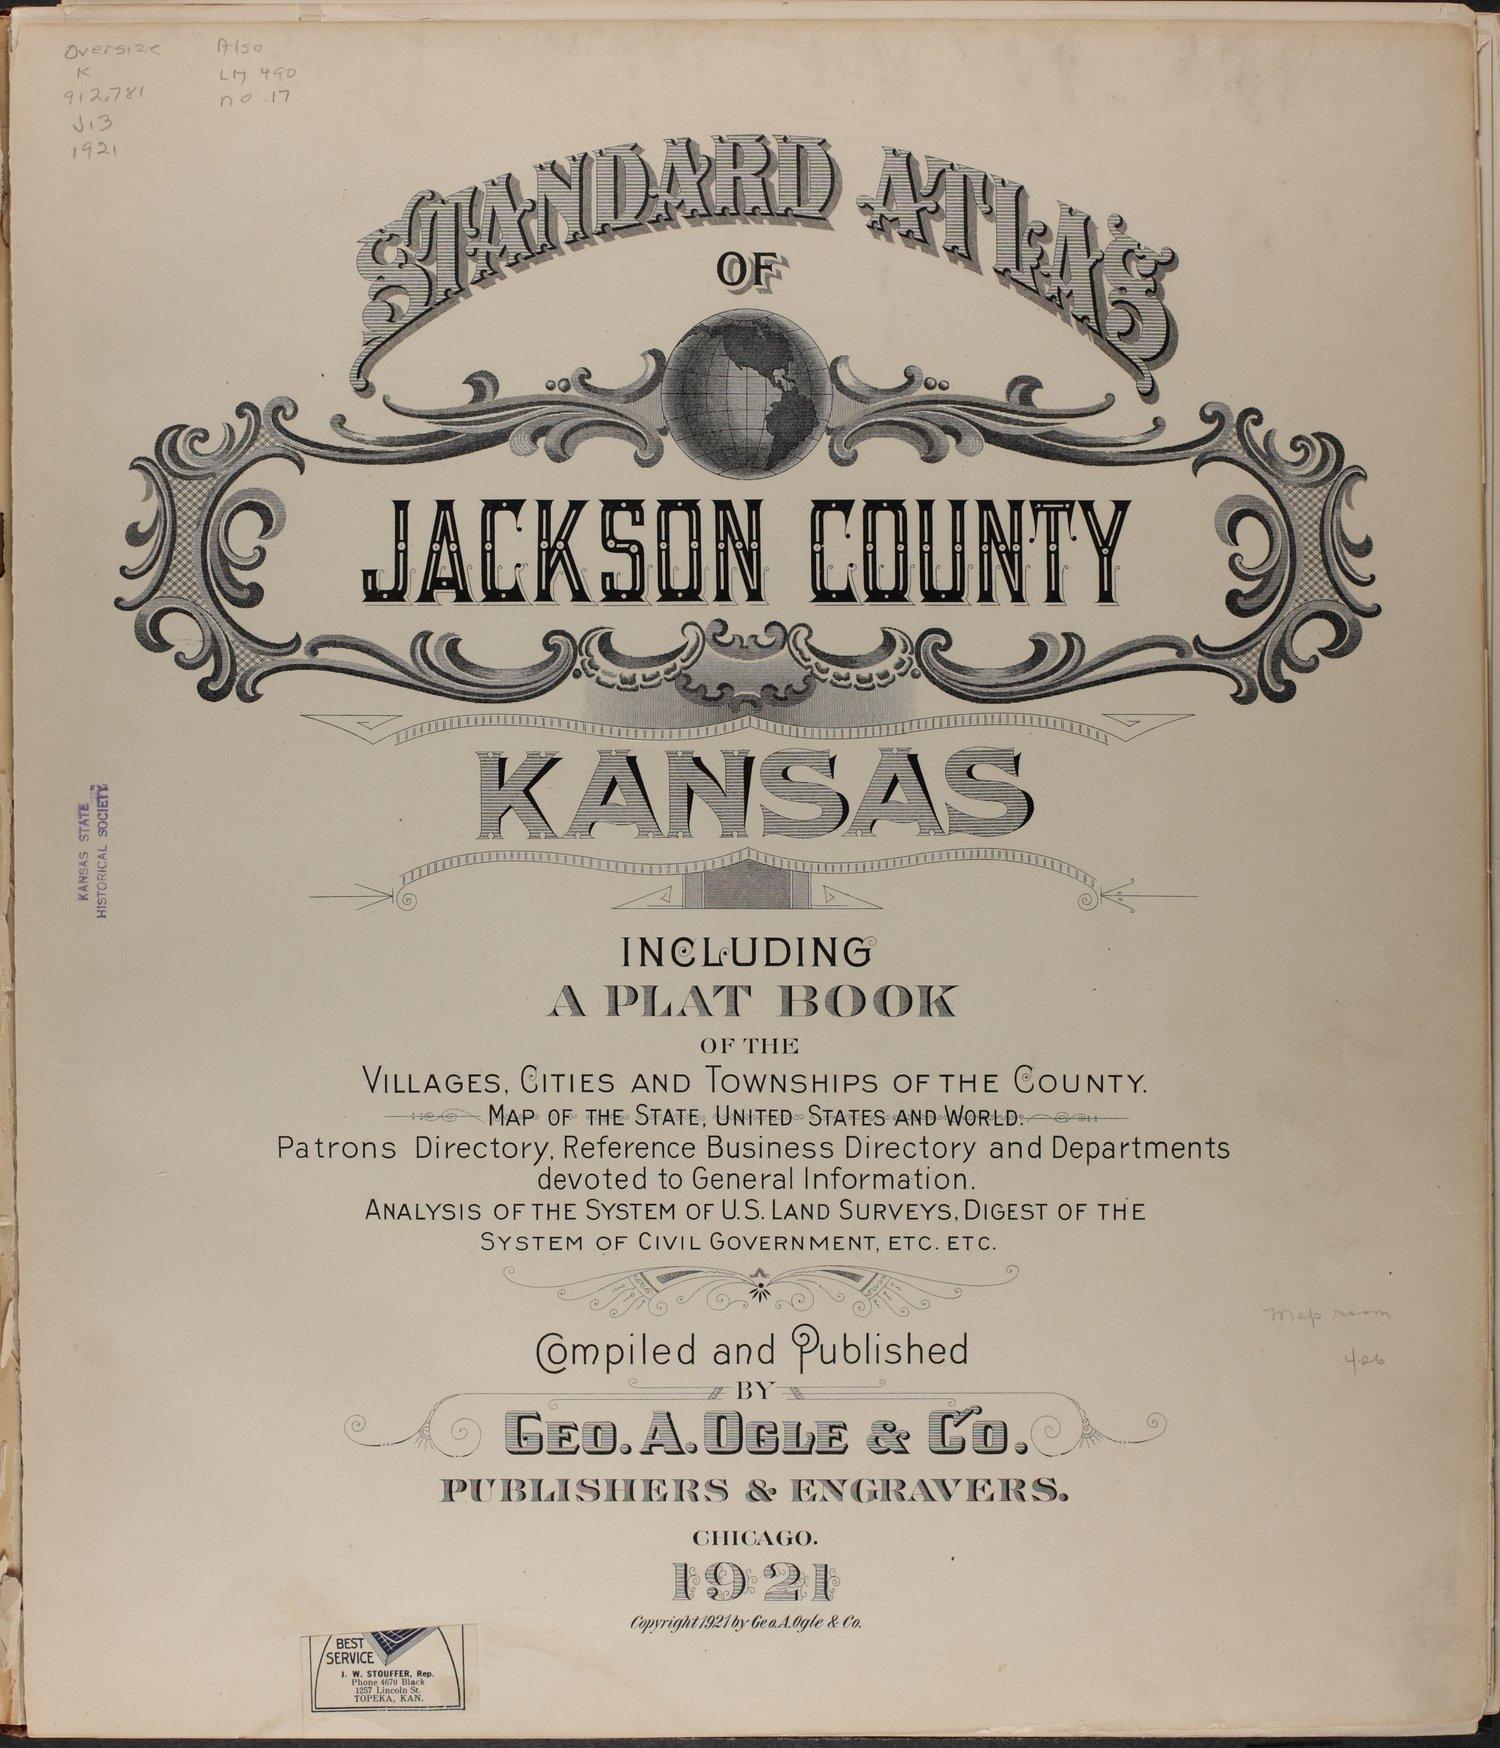 Standard atlas of Jackson County, Kansas - Title Page